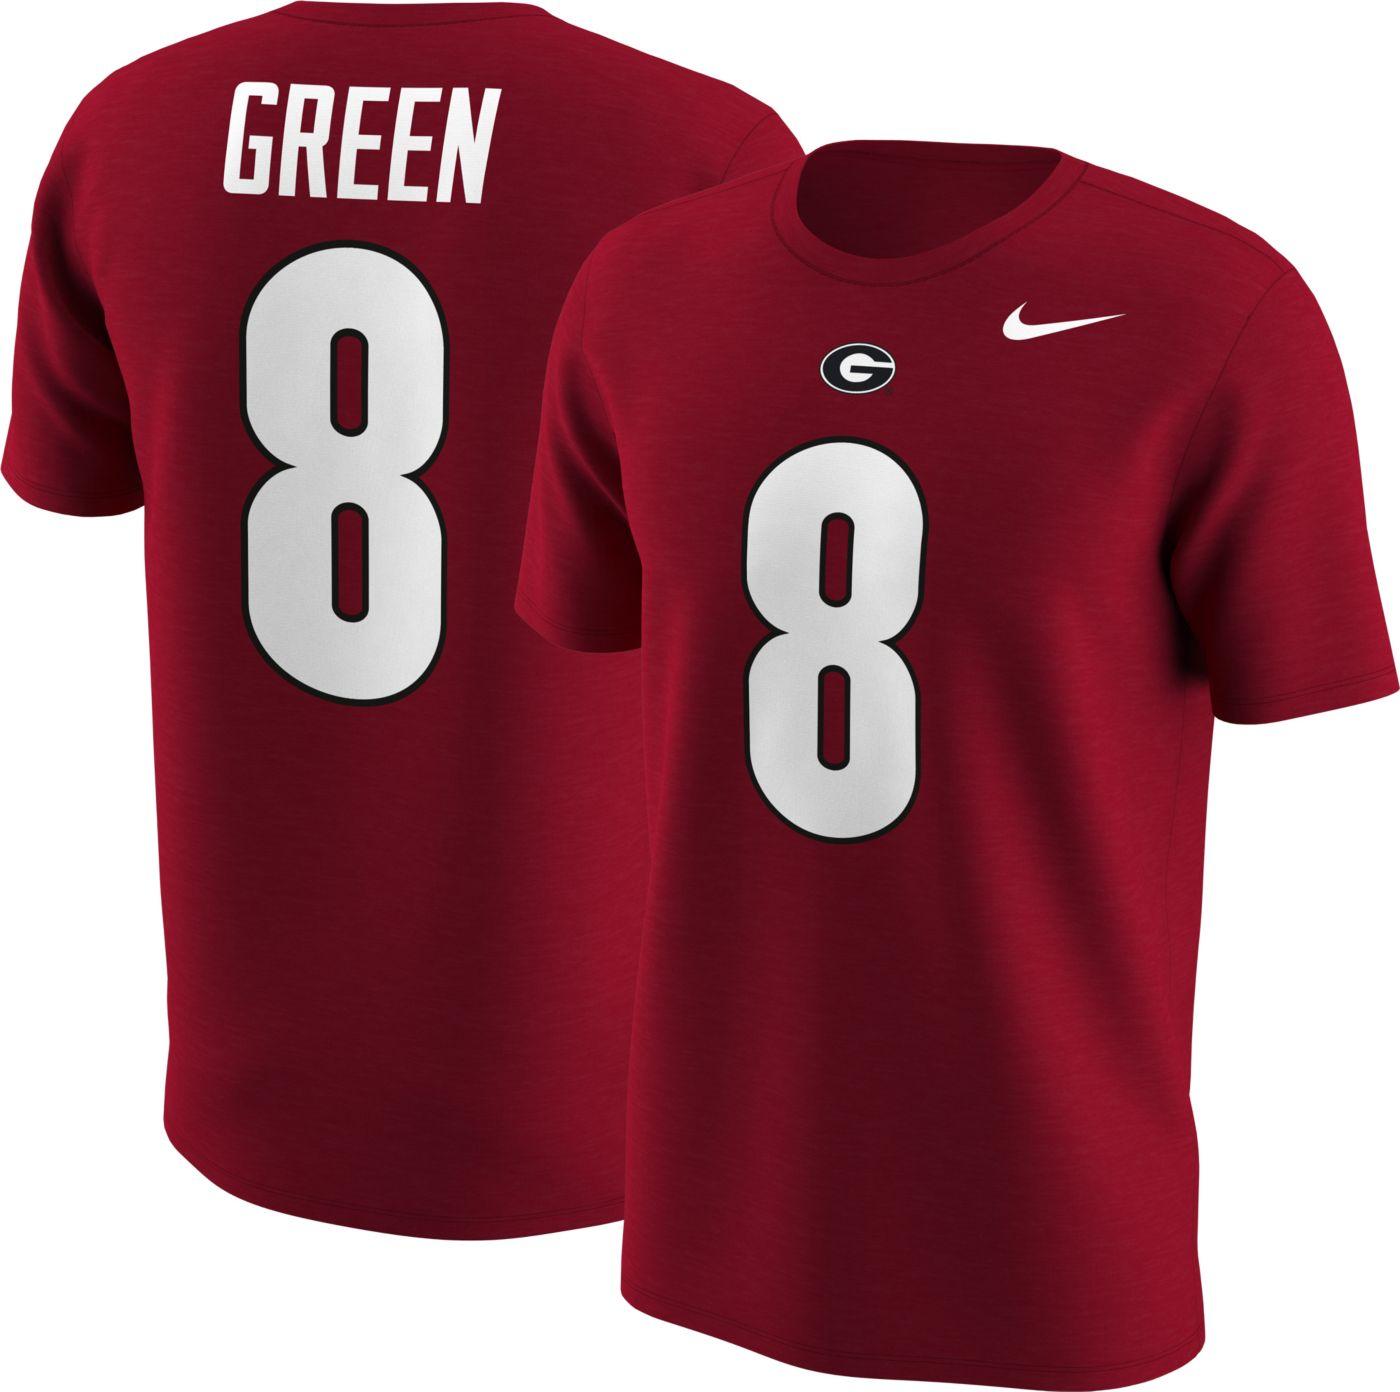 Nike Men's Georgia Bulldogs AJ Green #8 Red Football Jersey T-Shirt